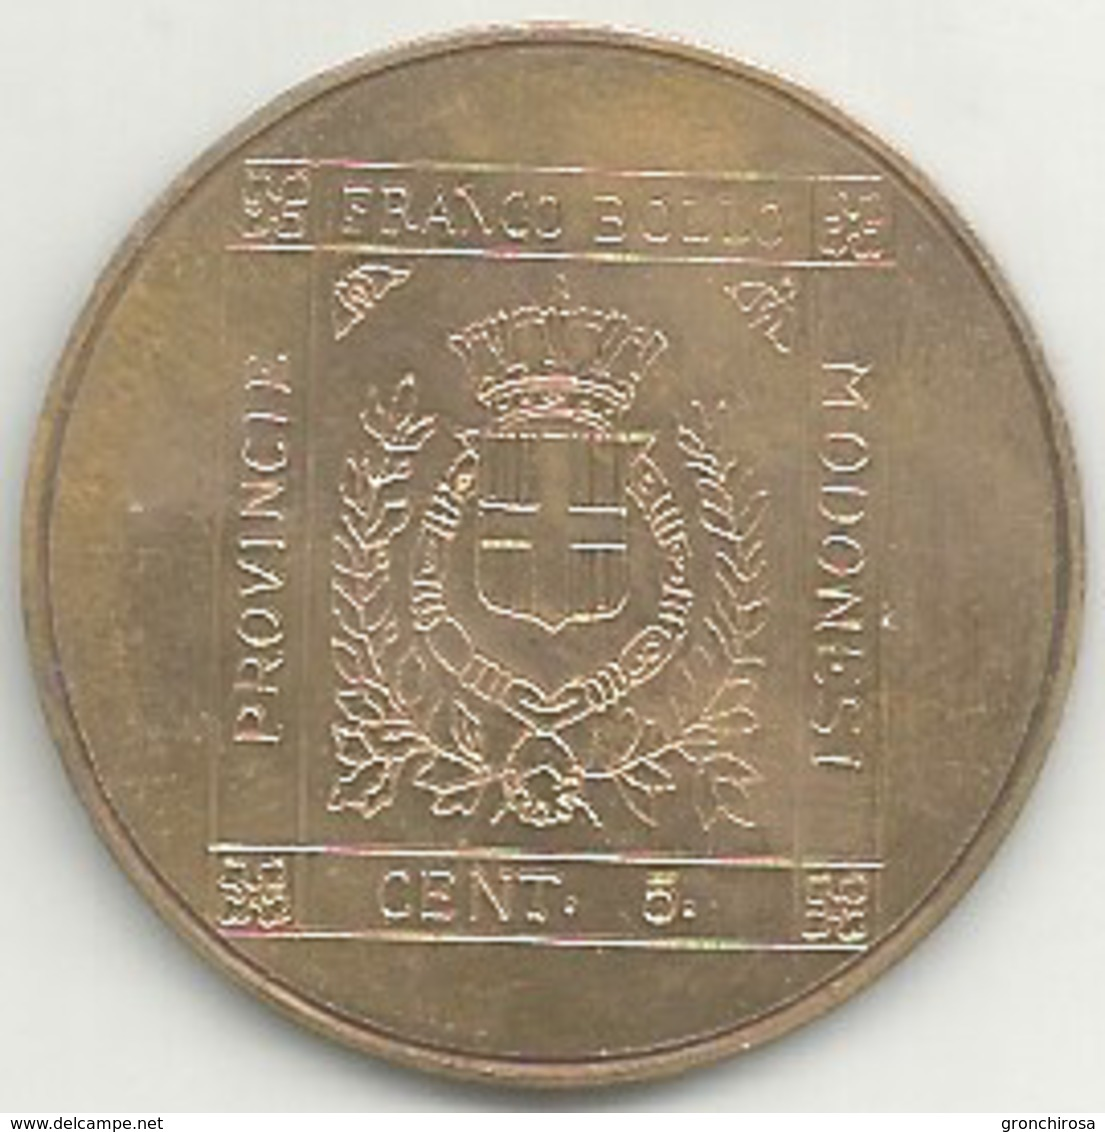 Vignola 1950 - 1980 Trentennale Gruppo Filatelico, Francobollo Provincie Modenesi, Cu., Gr. 12, Cm. 3,3. - Italia